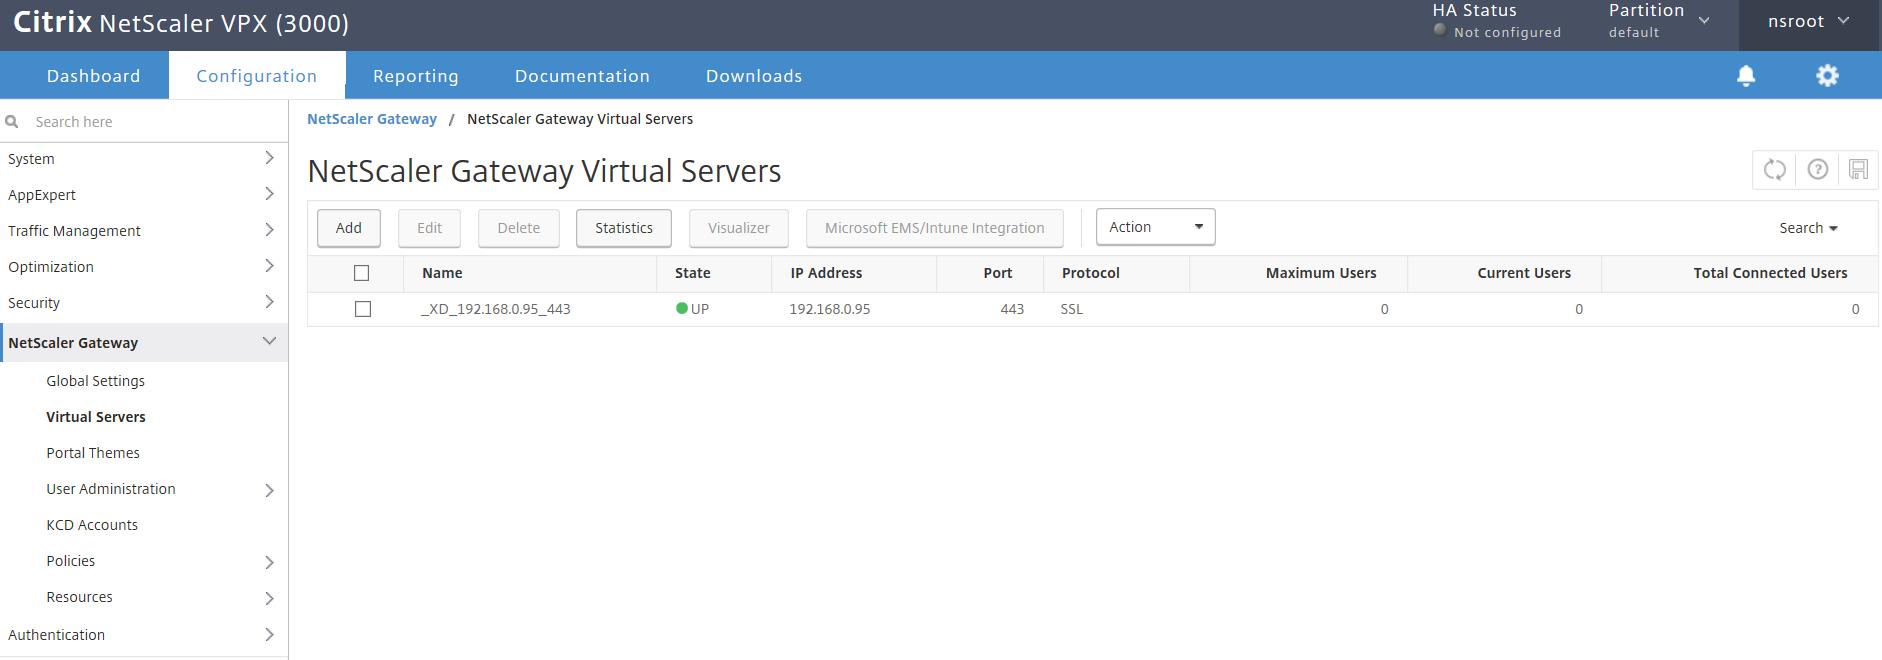 Cisco windows 10 vpn client download